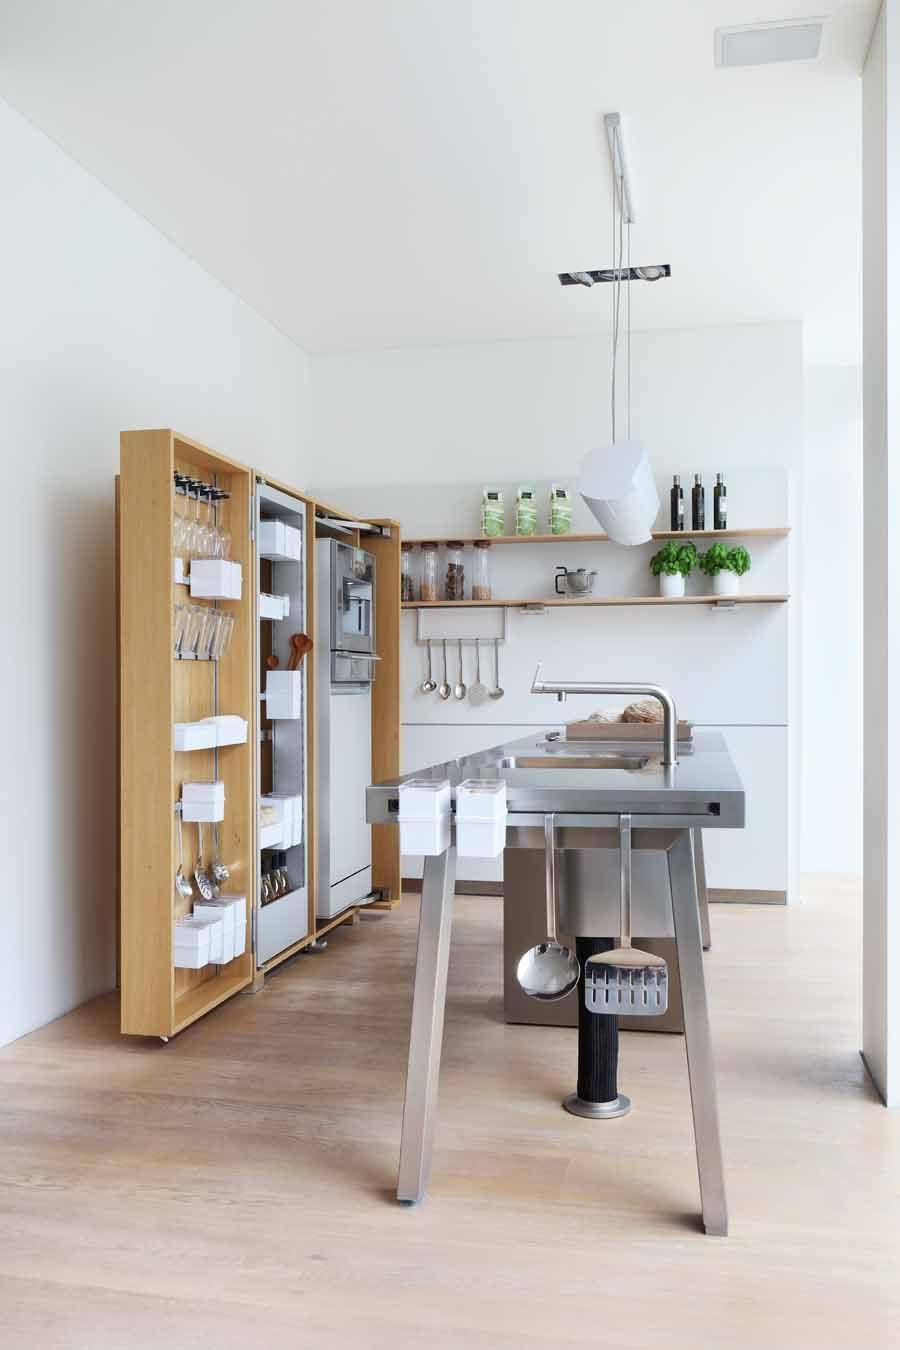 1000 images about bulthaup b2 the kitchen workshop on pinterest. Black Bedroom Furniture Sets. Home Design Ideas